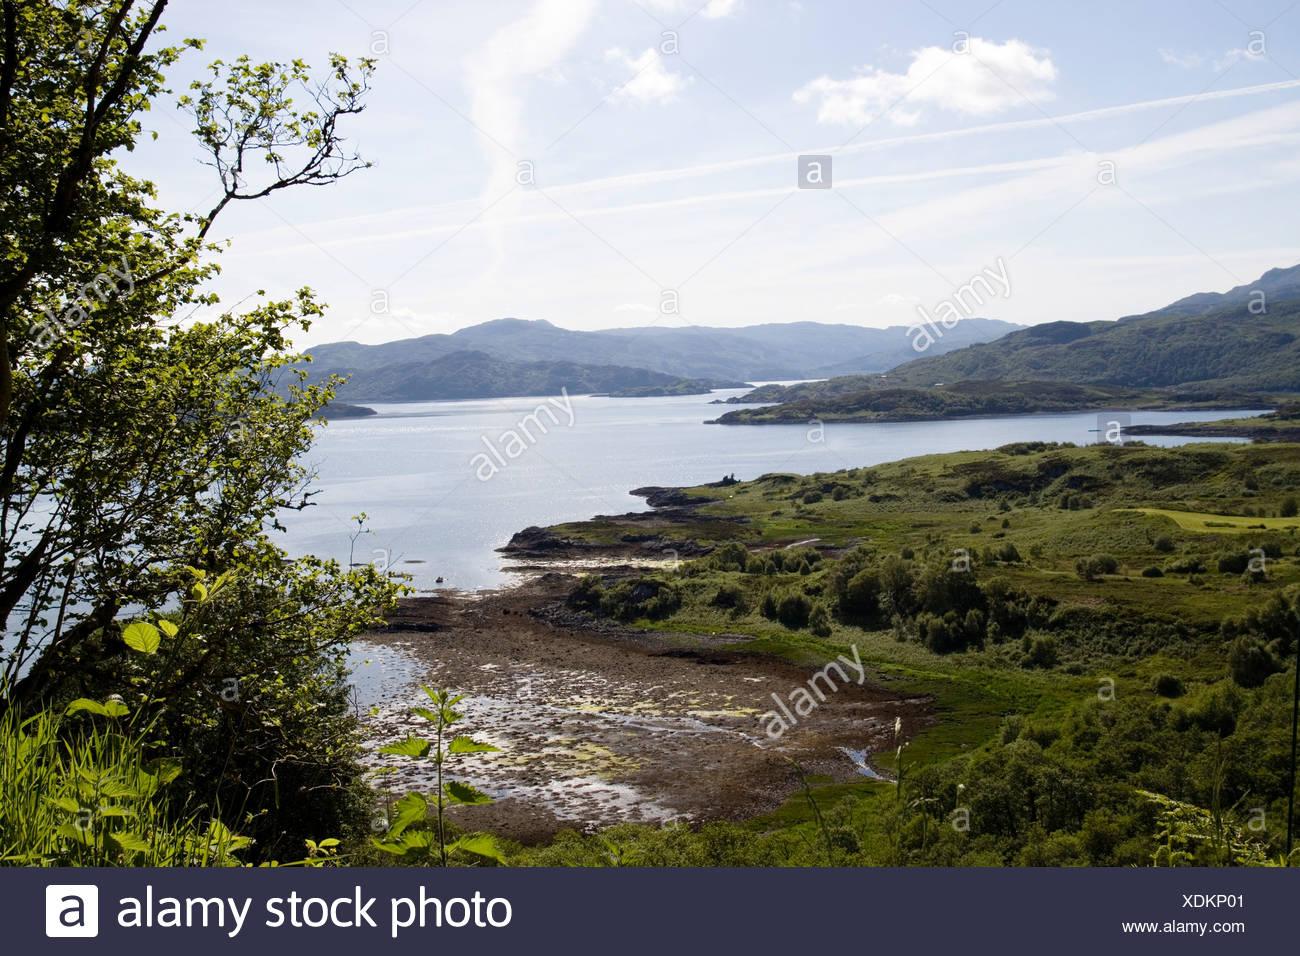 Scotland, Ardnamurchan, peninsula on Loch Sunart - Stock Image